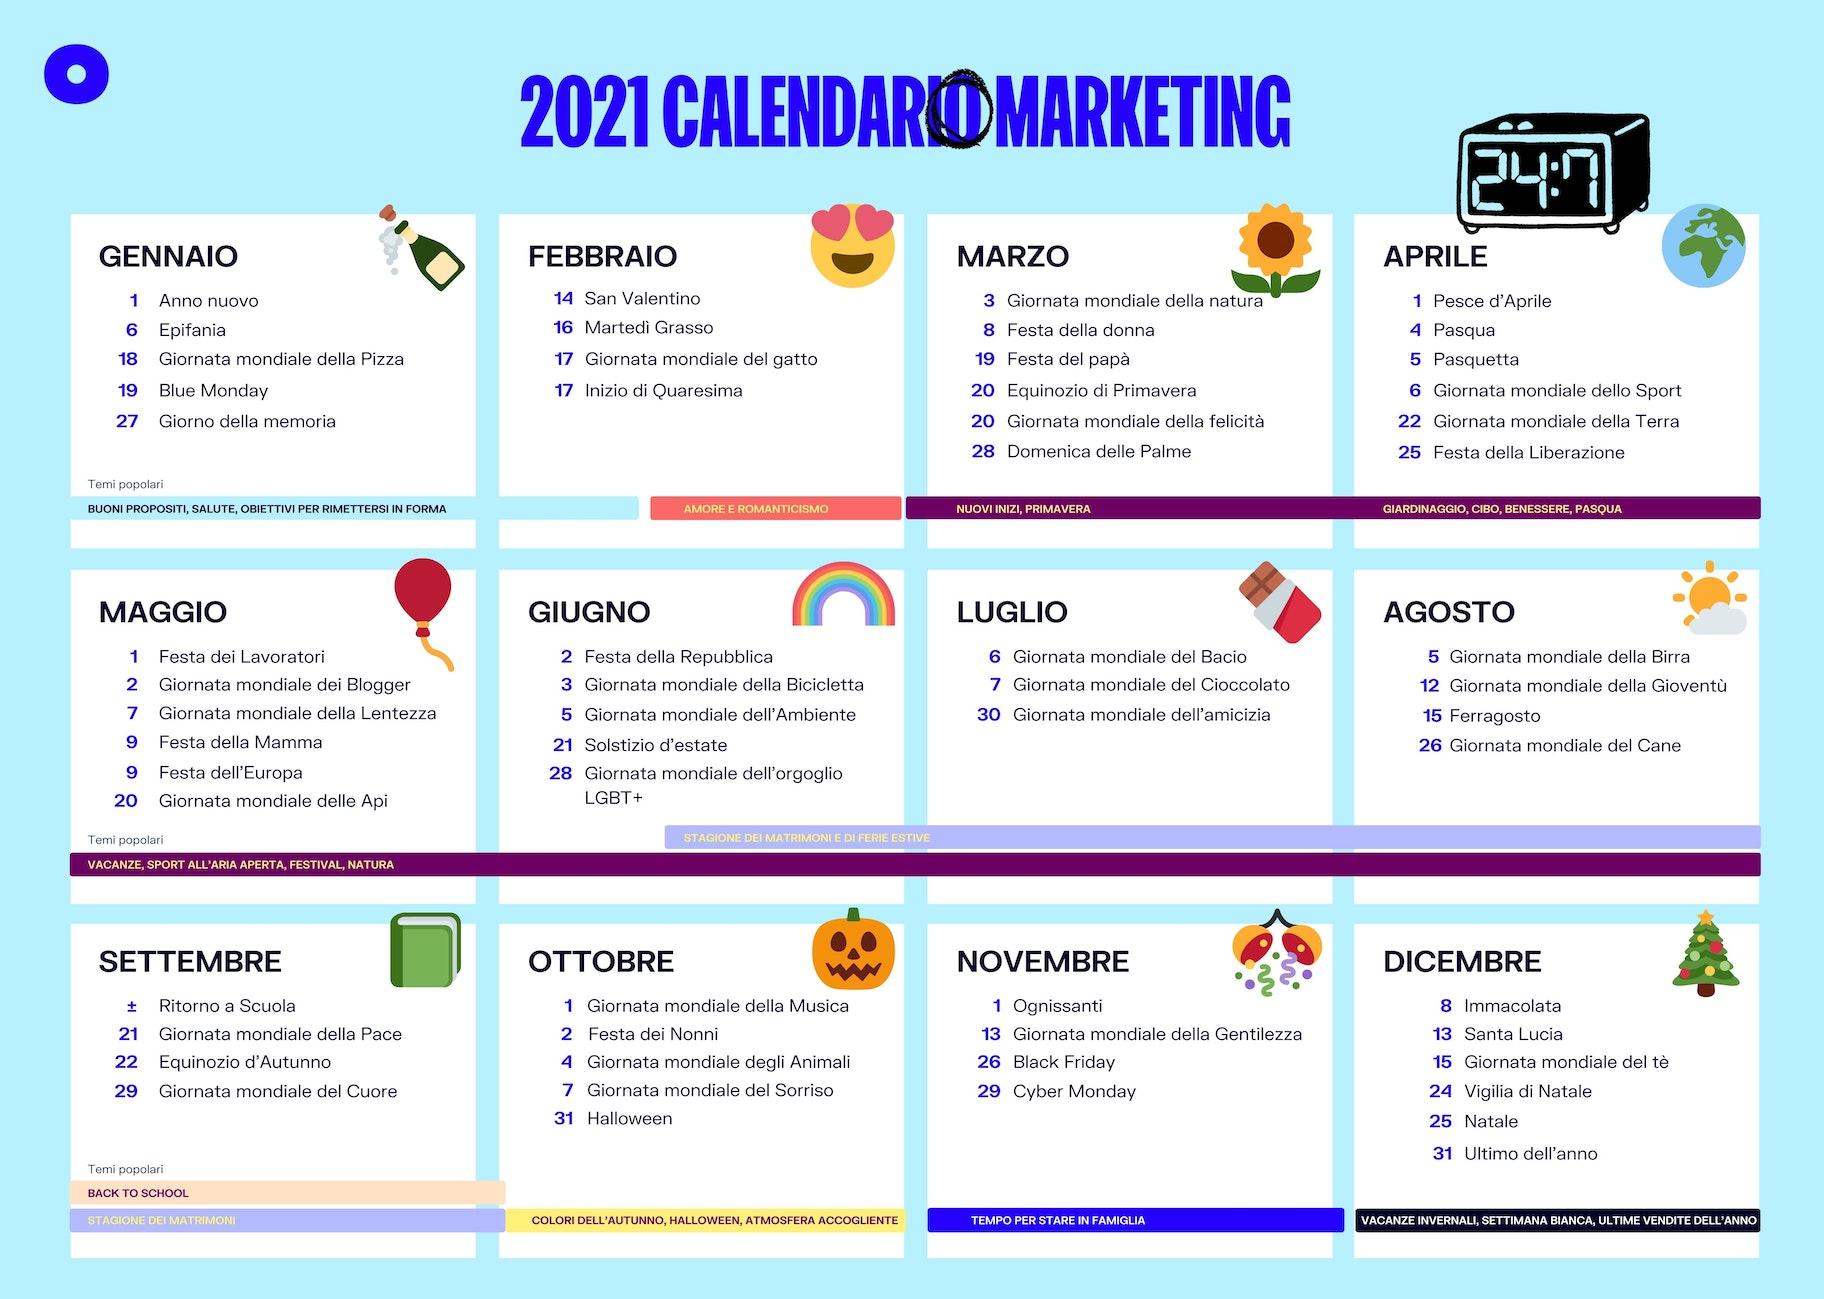 calendario per ecommerce 2021